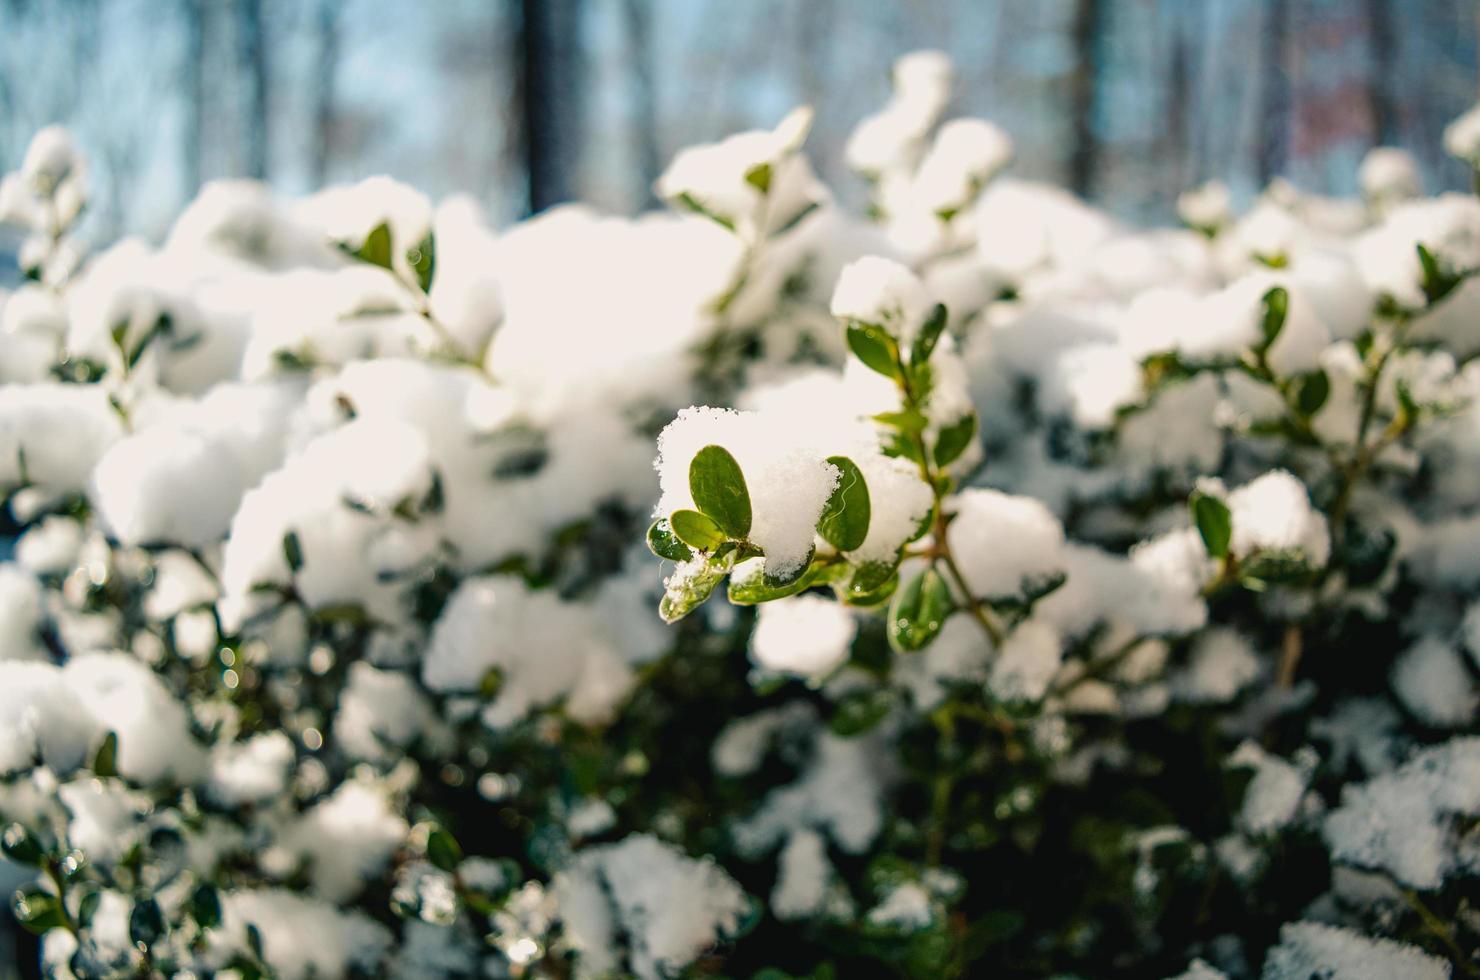 Snow on leaves photo